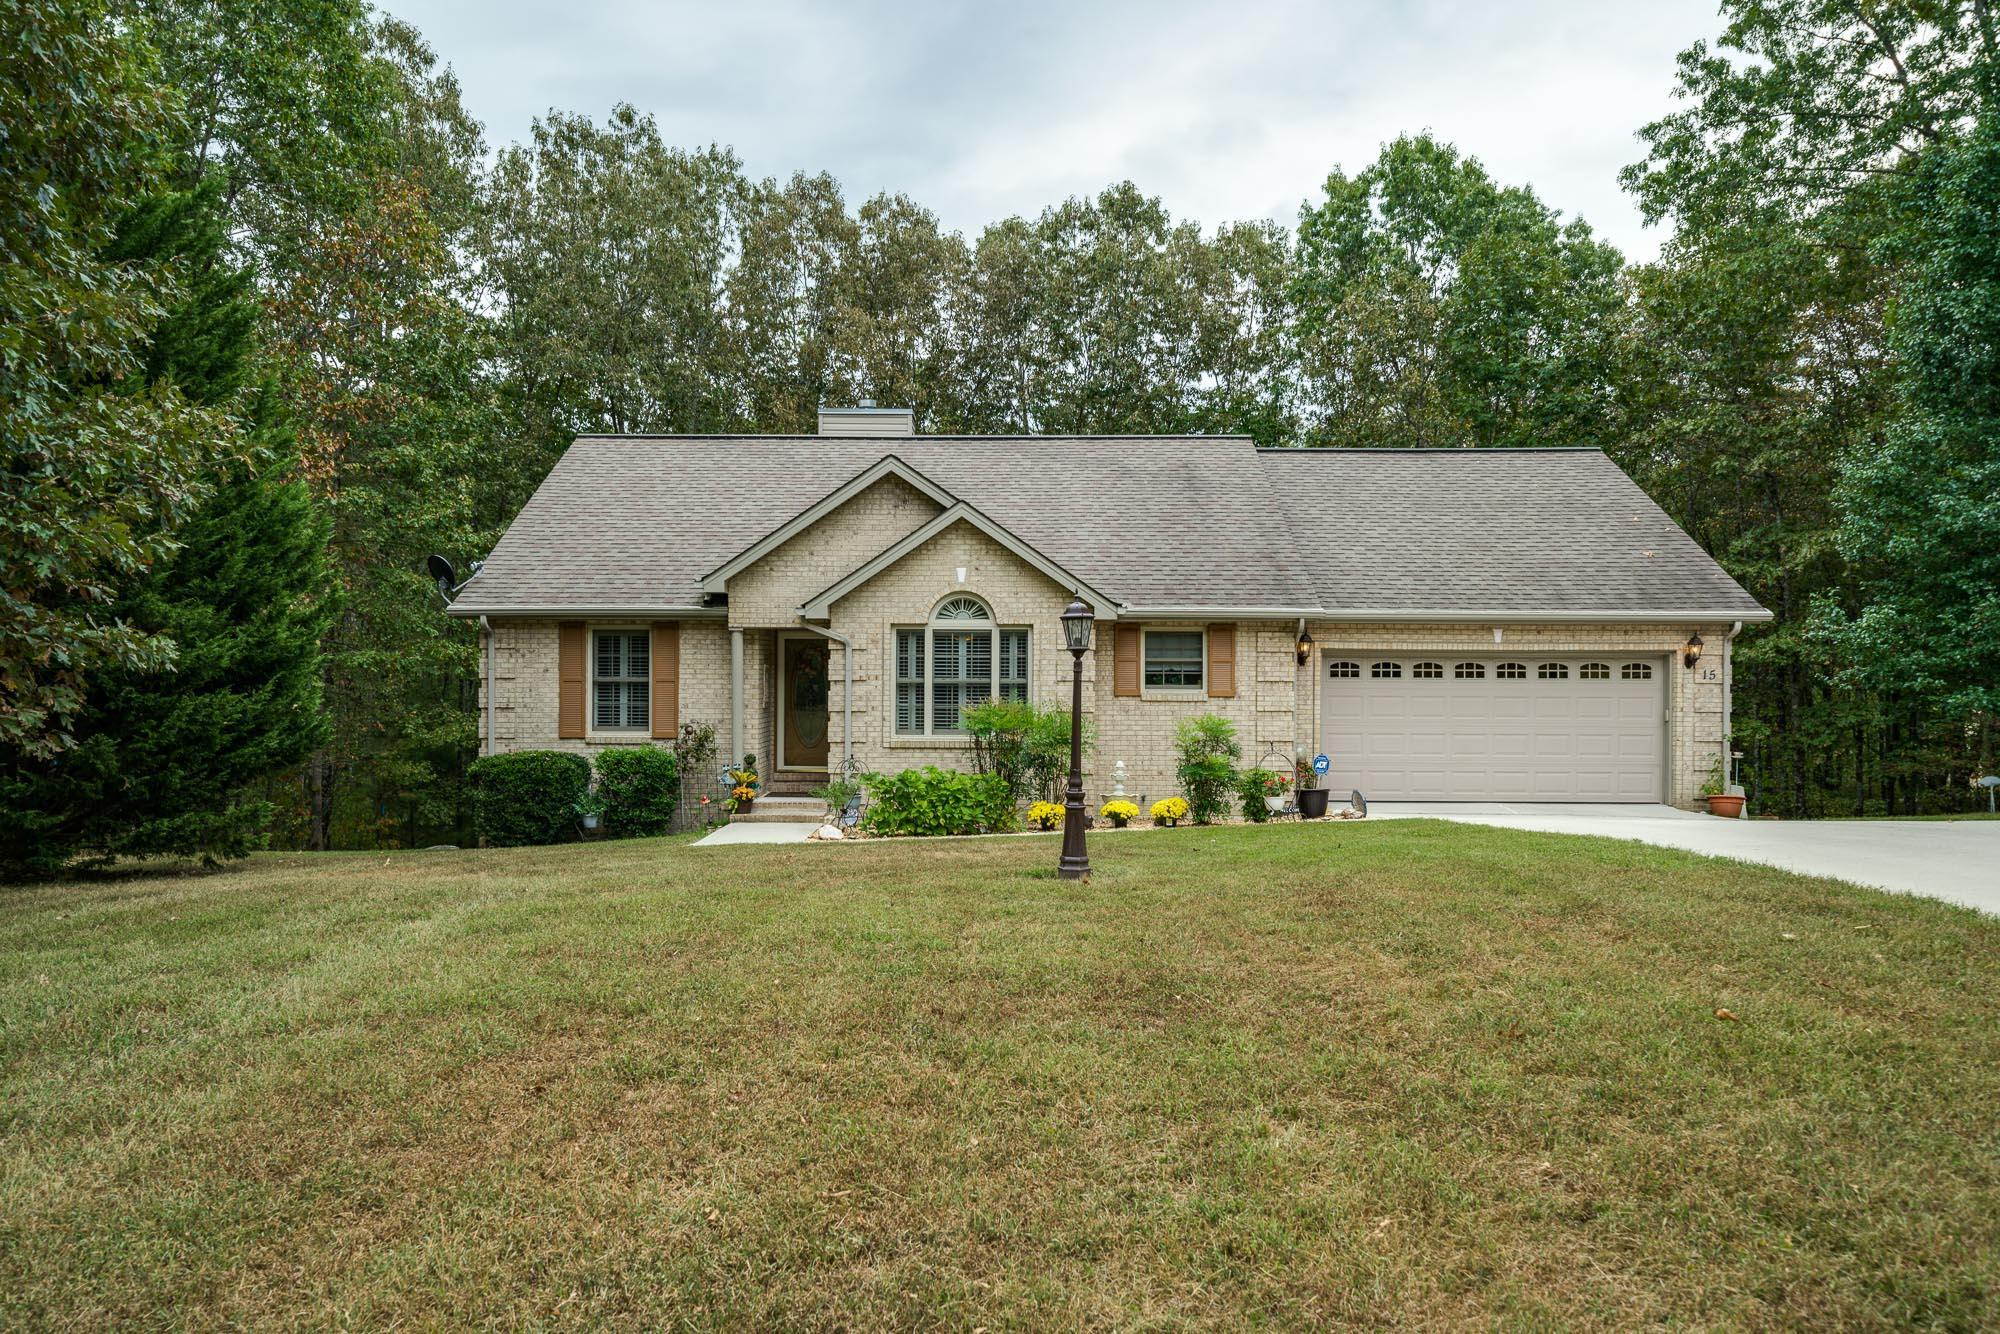 15 Carnoustie Dr, Crossville, TN 38558 - Crossville, TN real estate listing